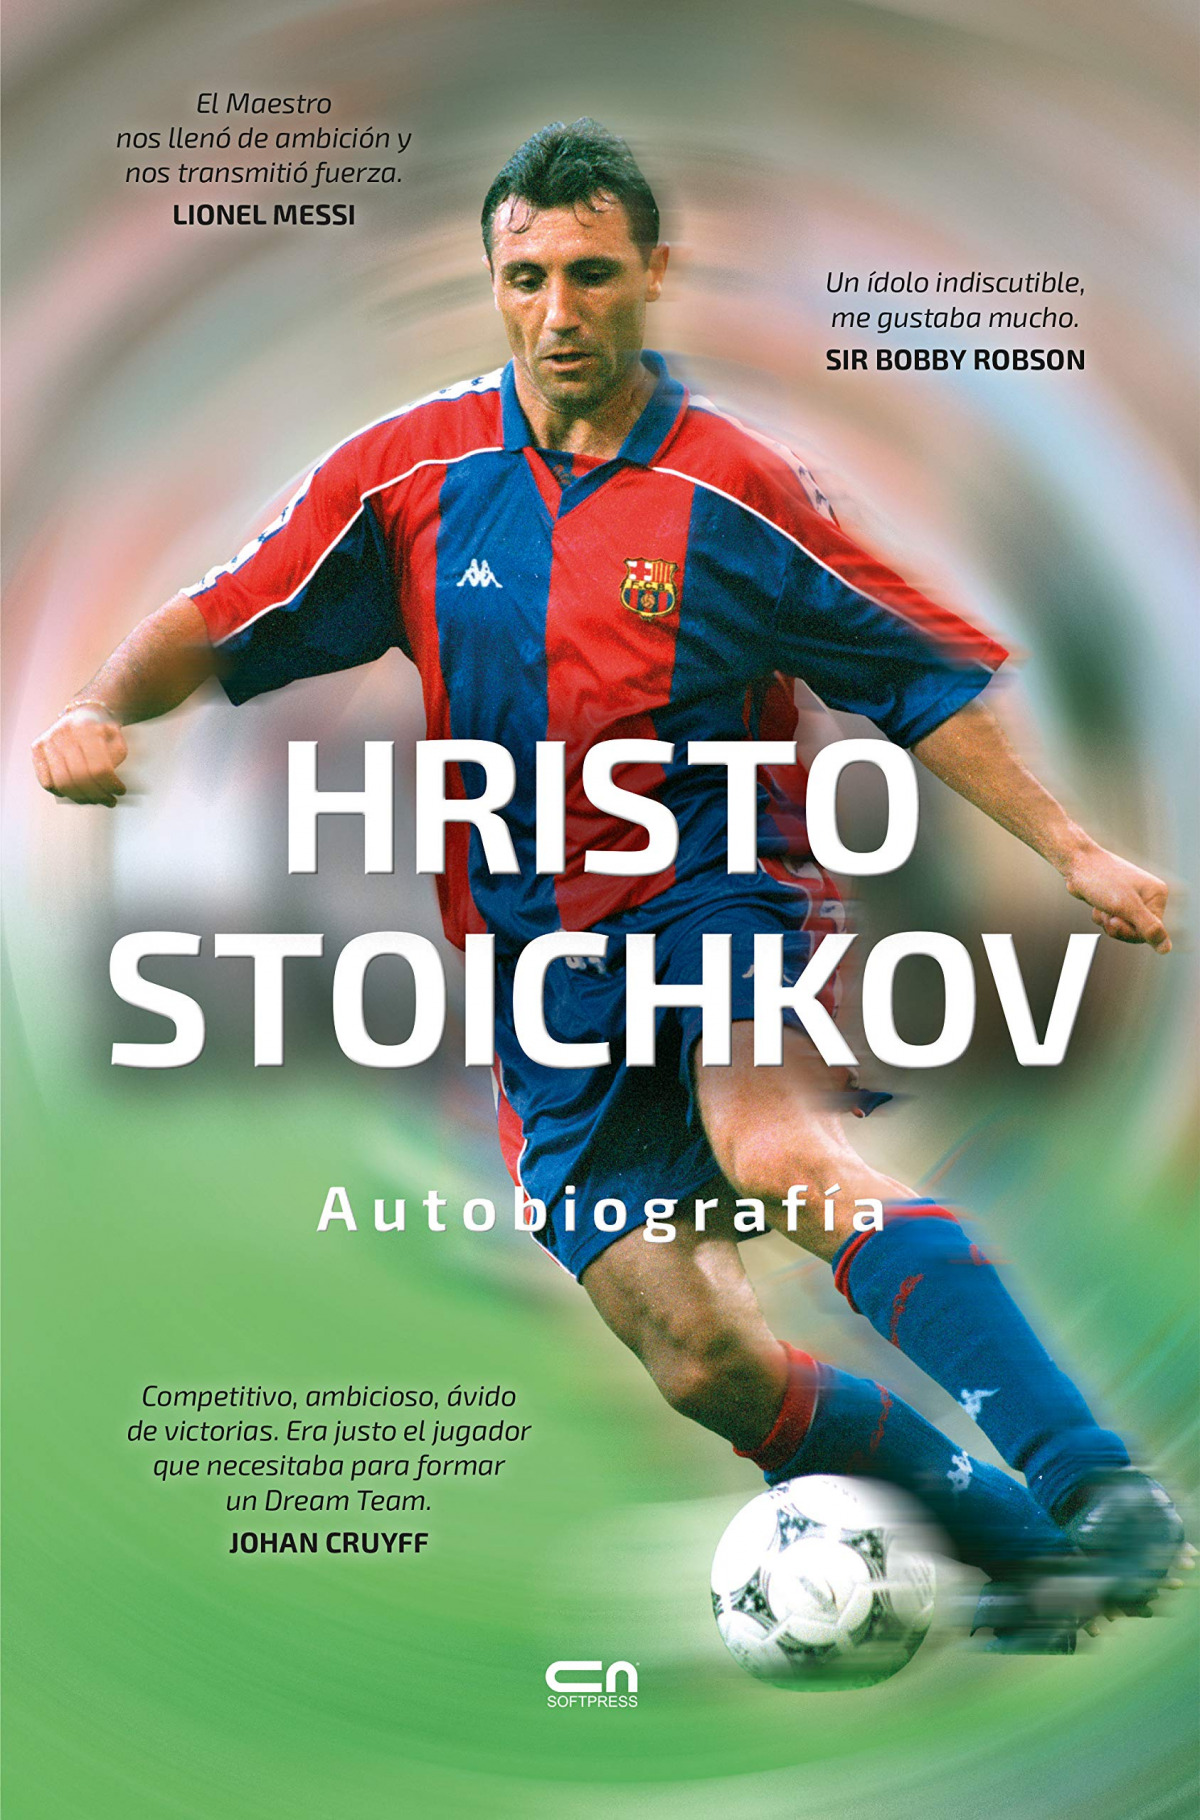 HRISTO STOICHKOV. AUTOBIOGRAFIA